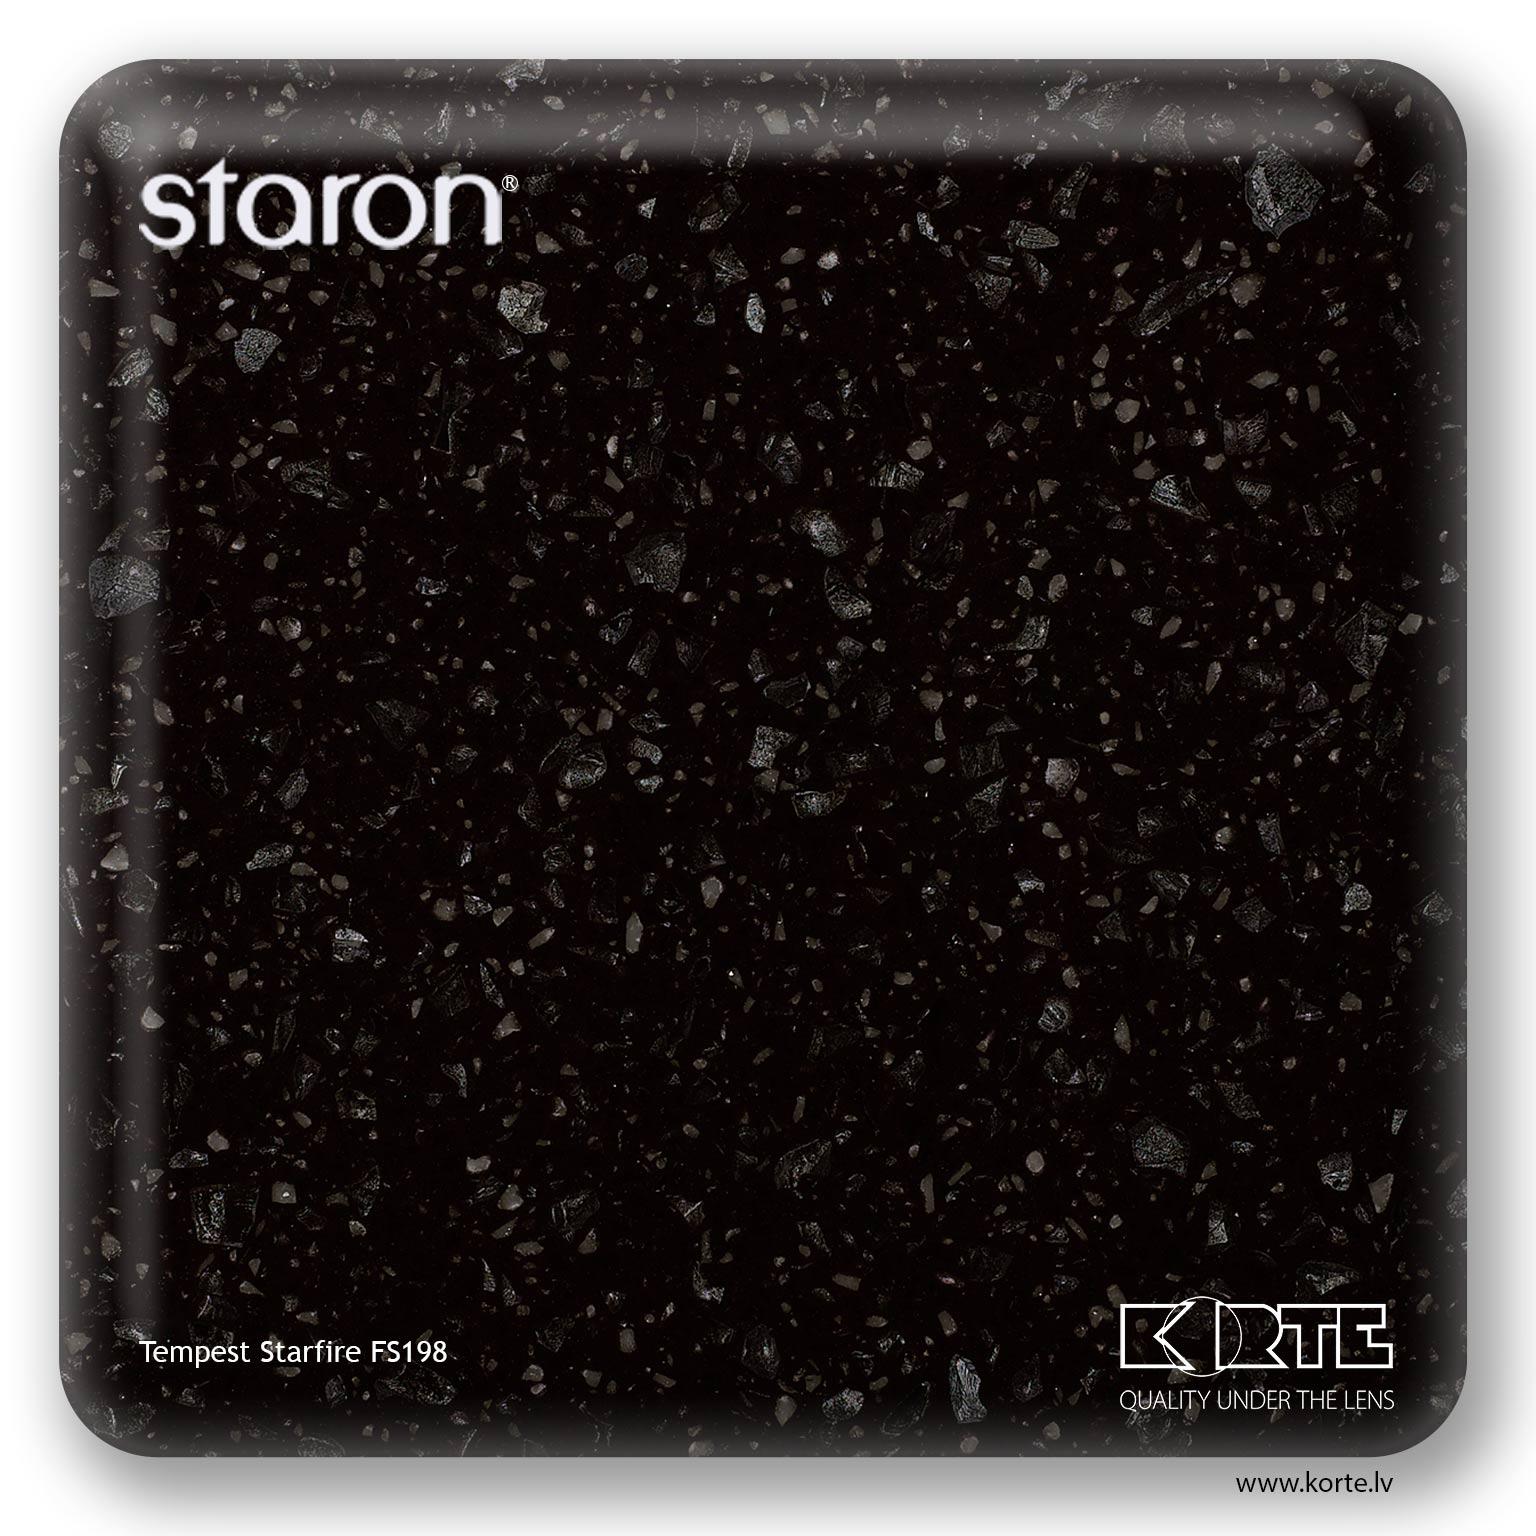 Staron Tempest Starfire FS198